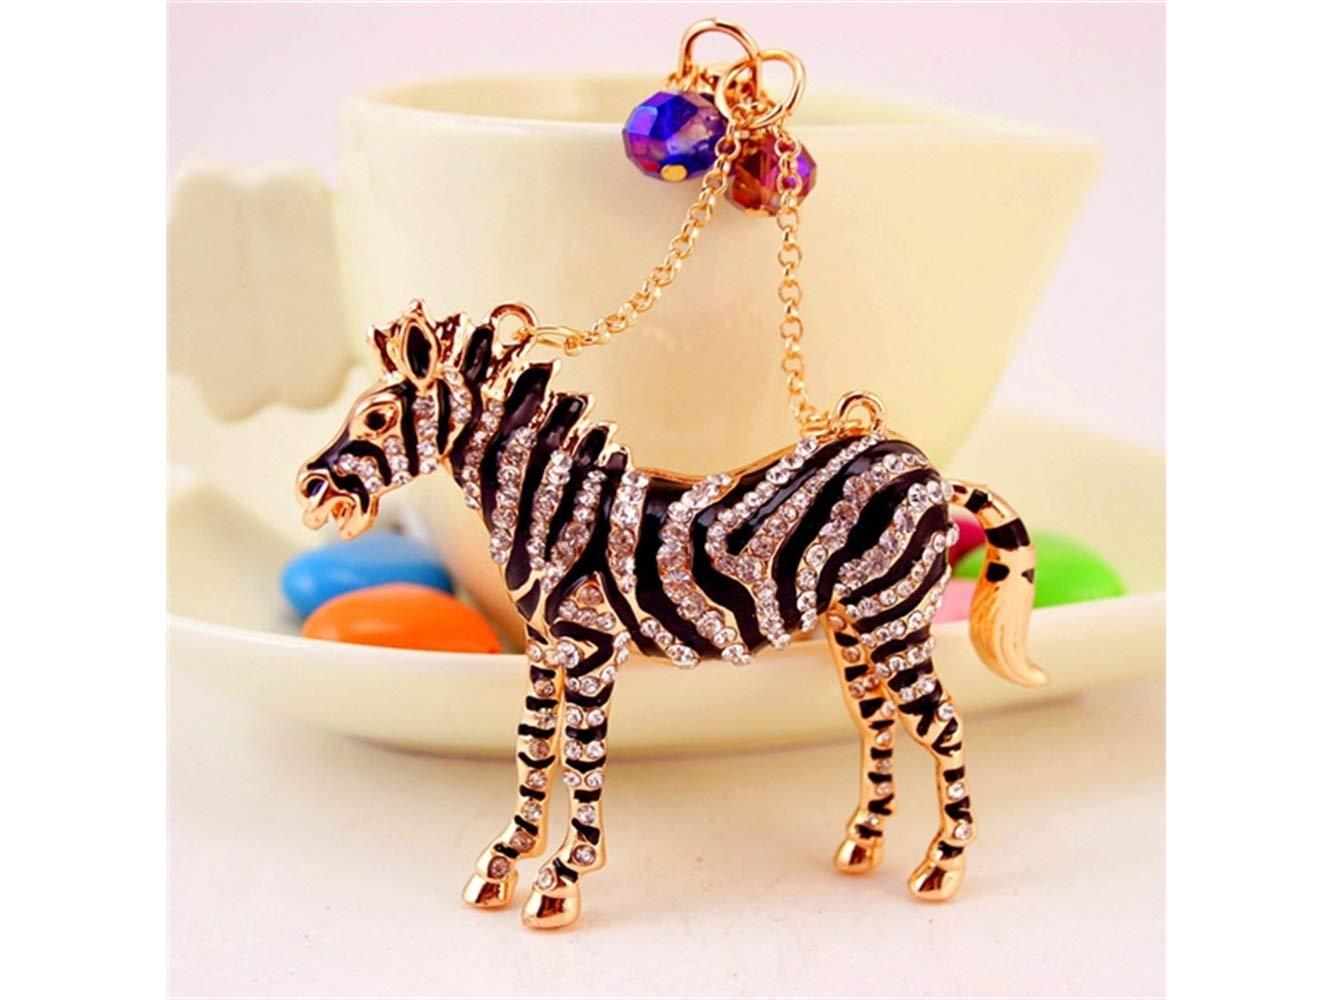 Car Keychain, Cute Exquisite Zebra Keychain Animal Key Trinket Car Bag Key Holder Decorations(Black) for Gift by Huasen (Image #4)